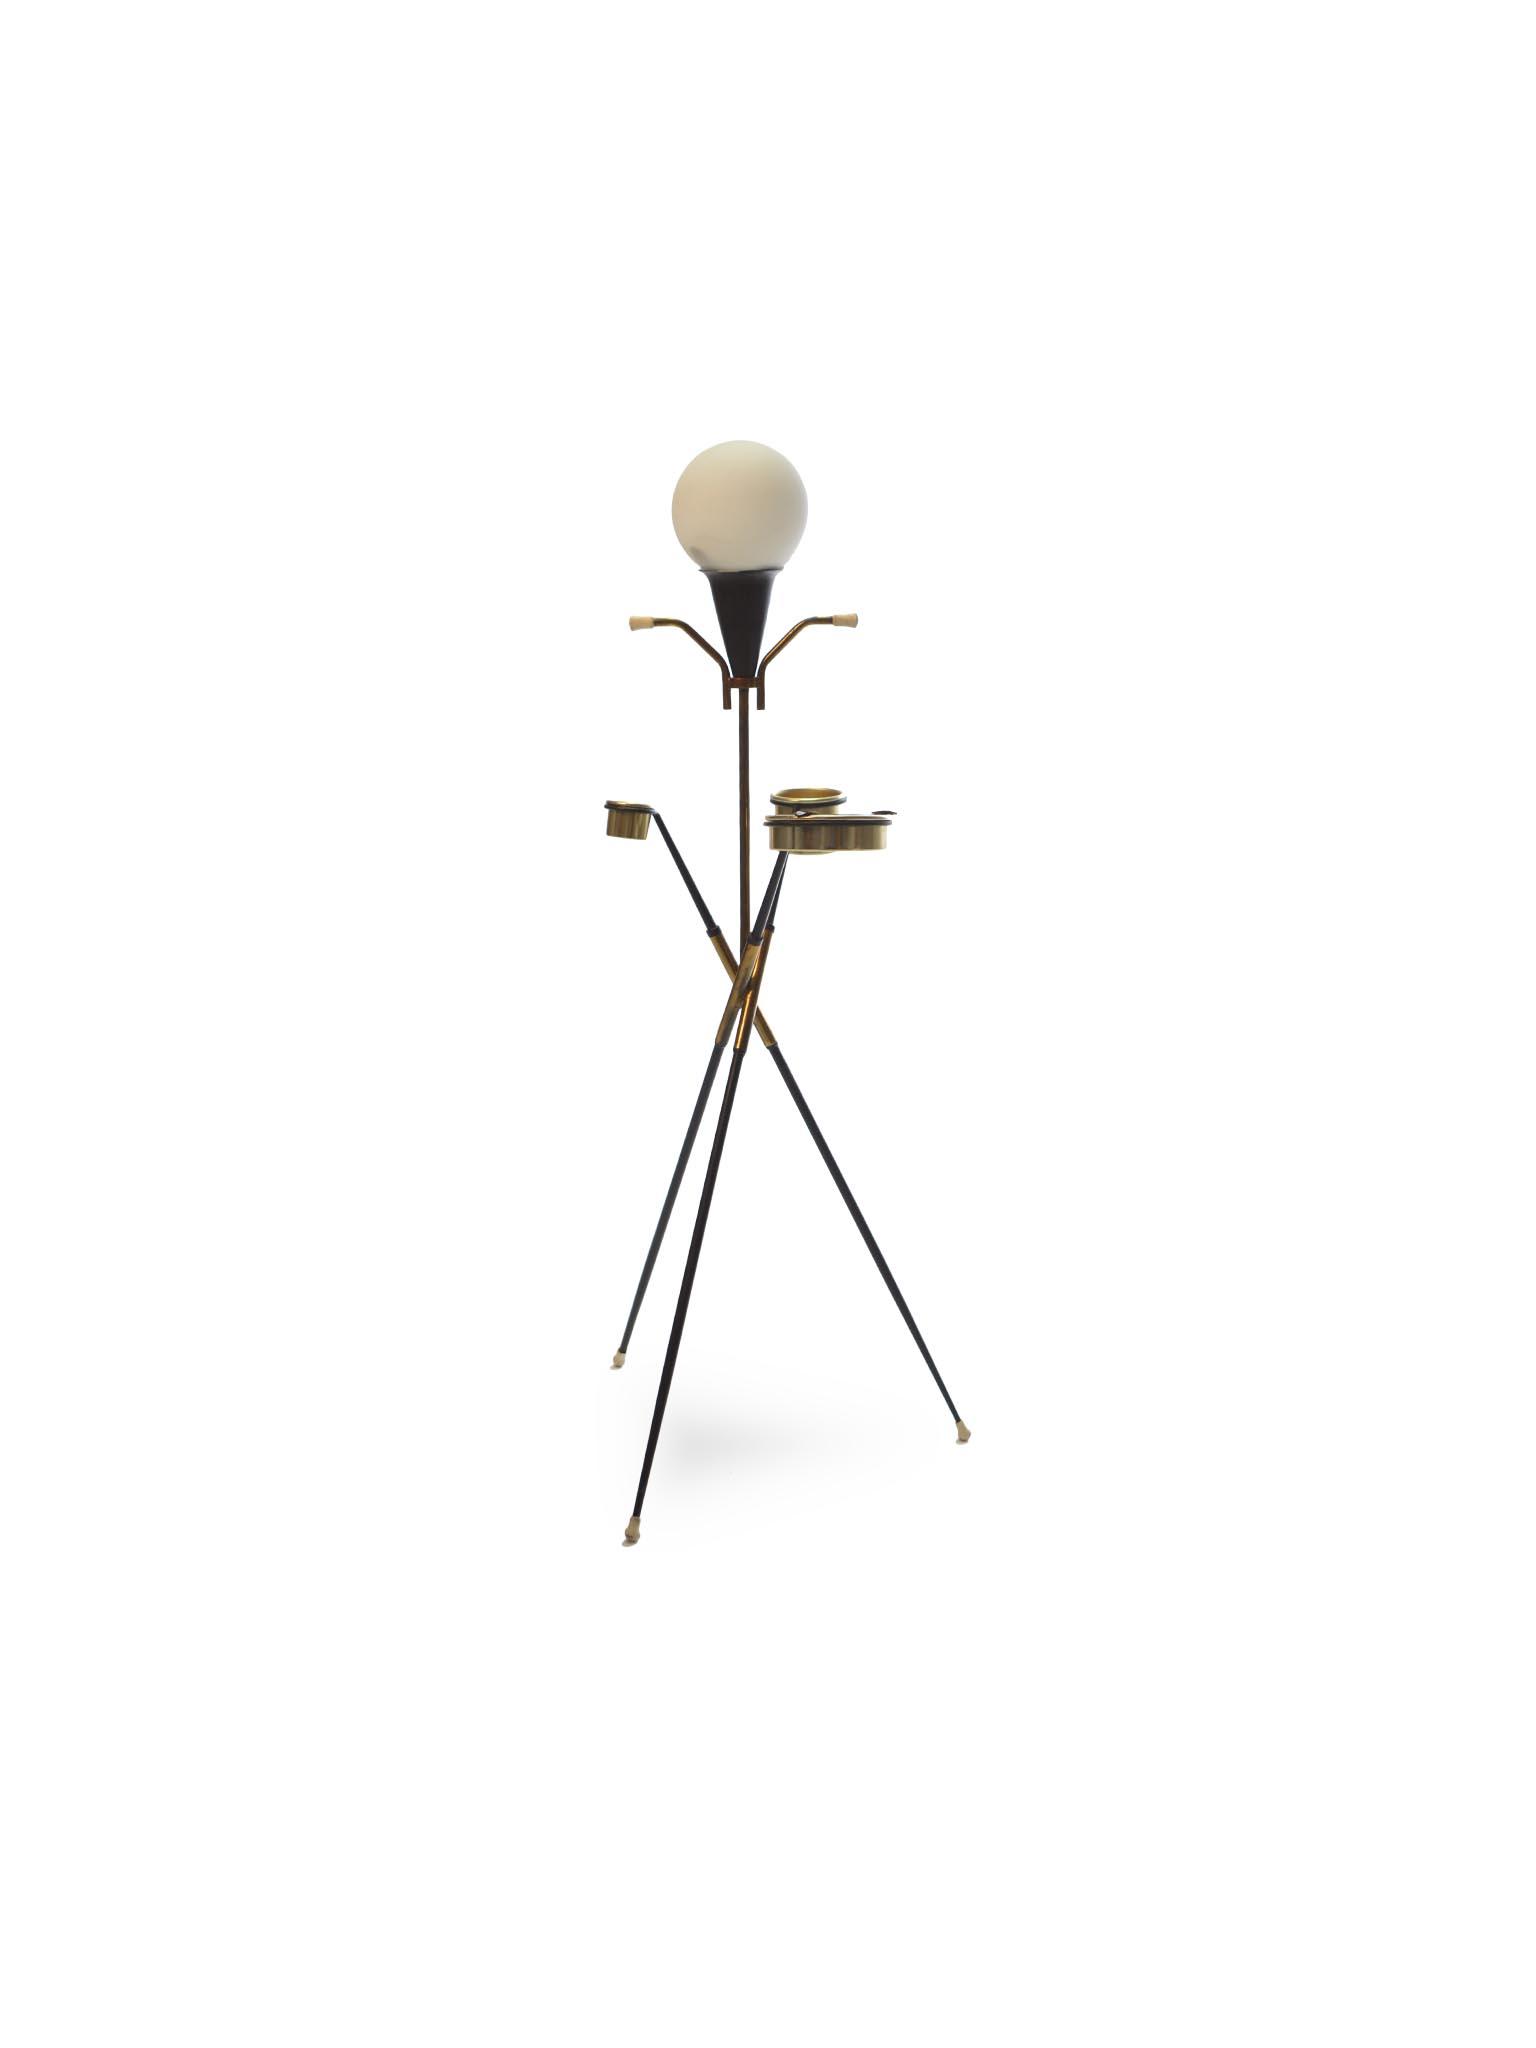 FLOOR LAMP PRODUCED BY STILNOVO